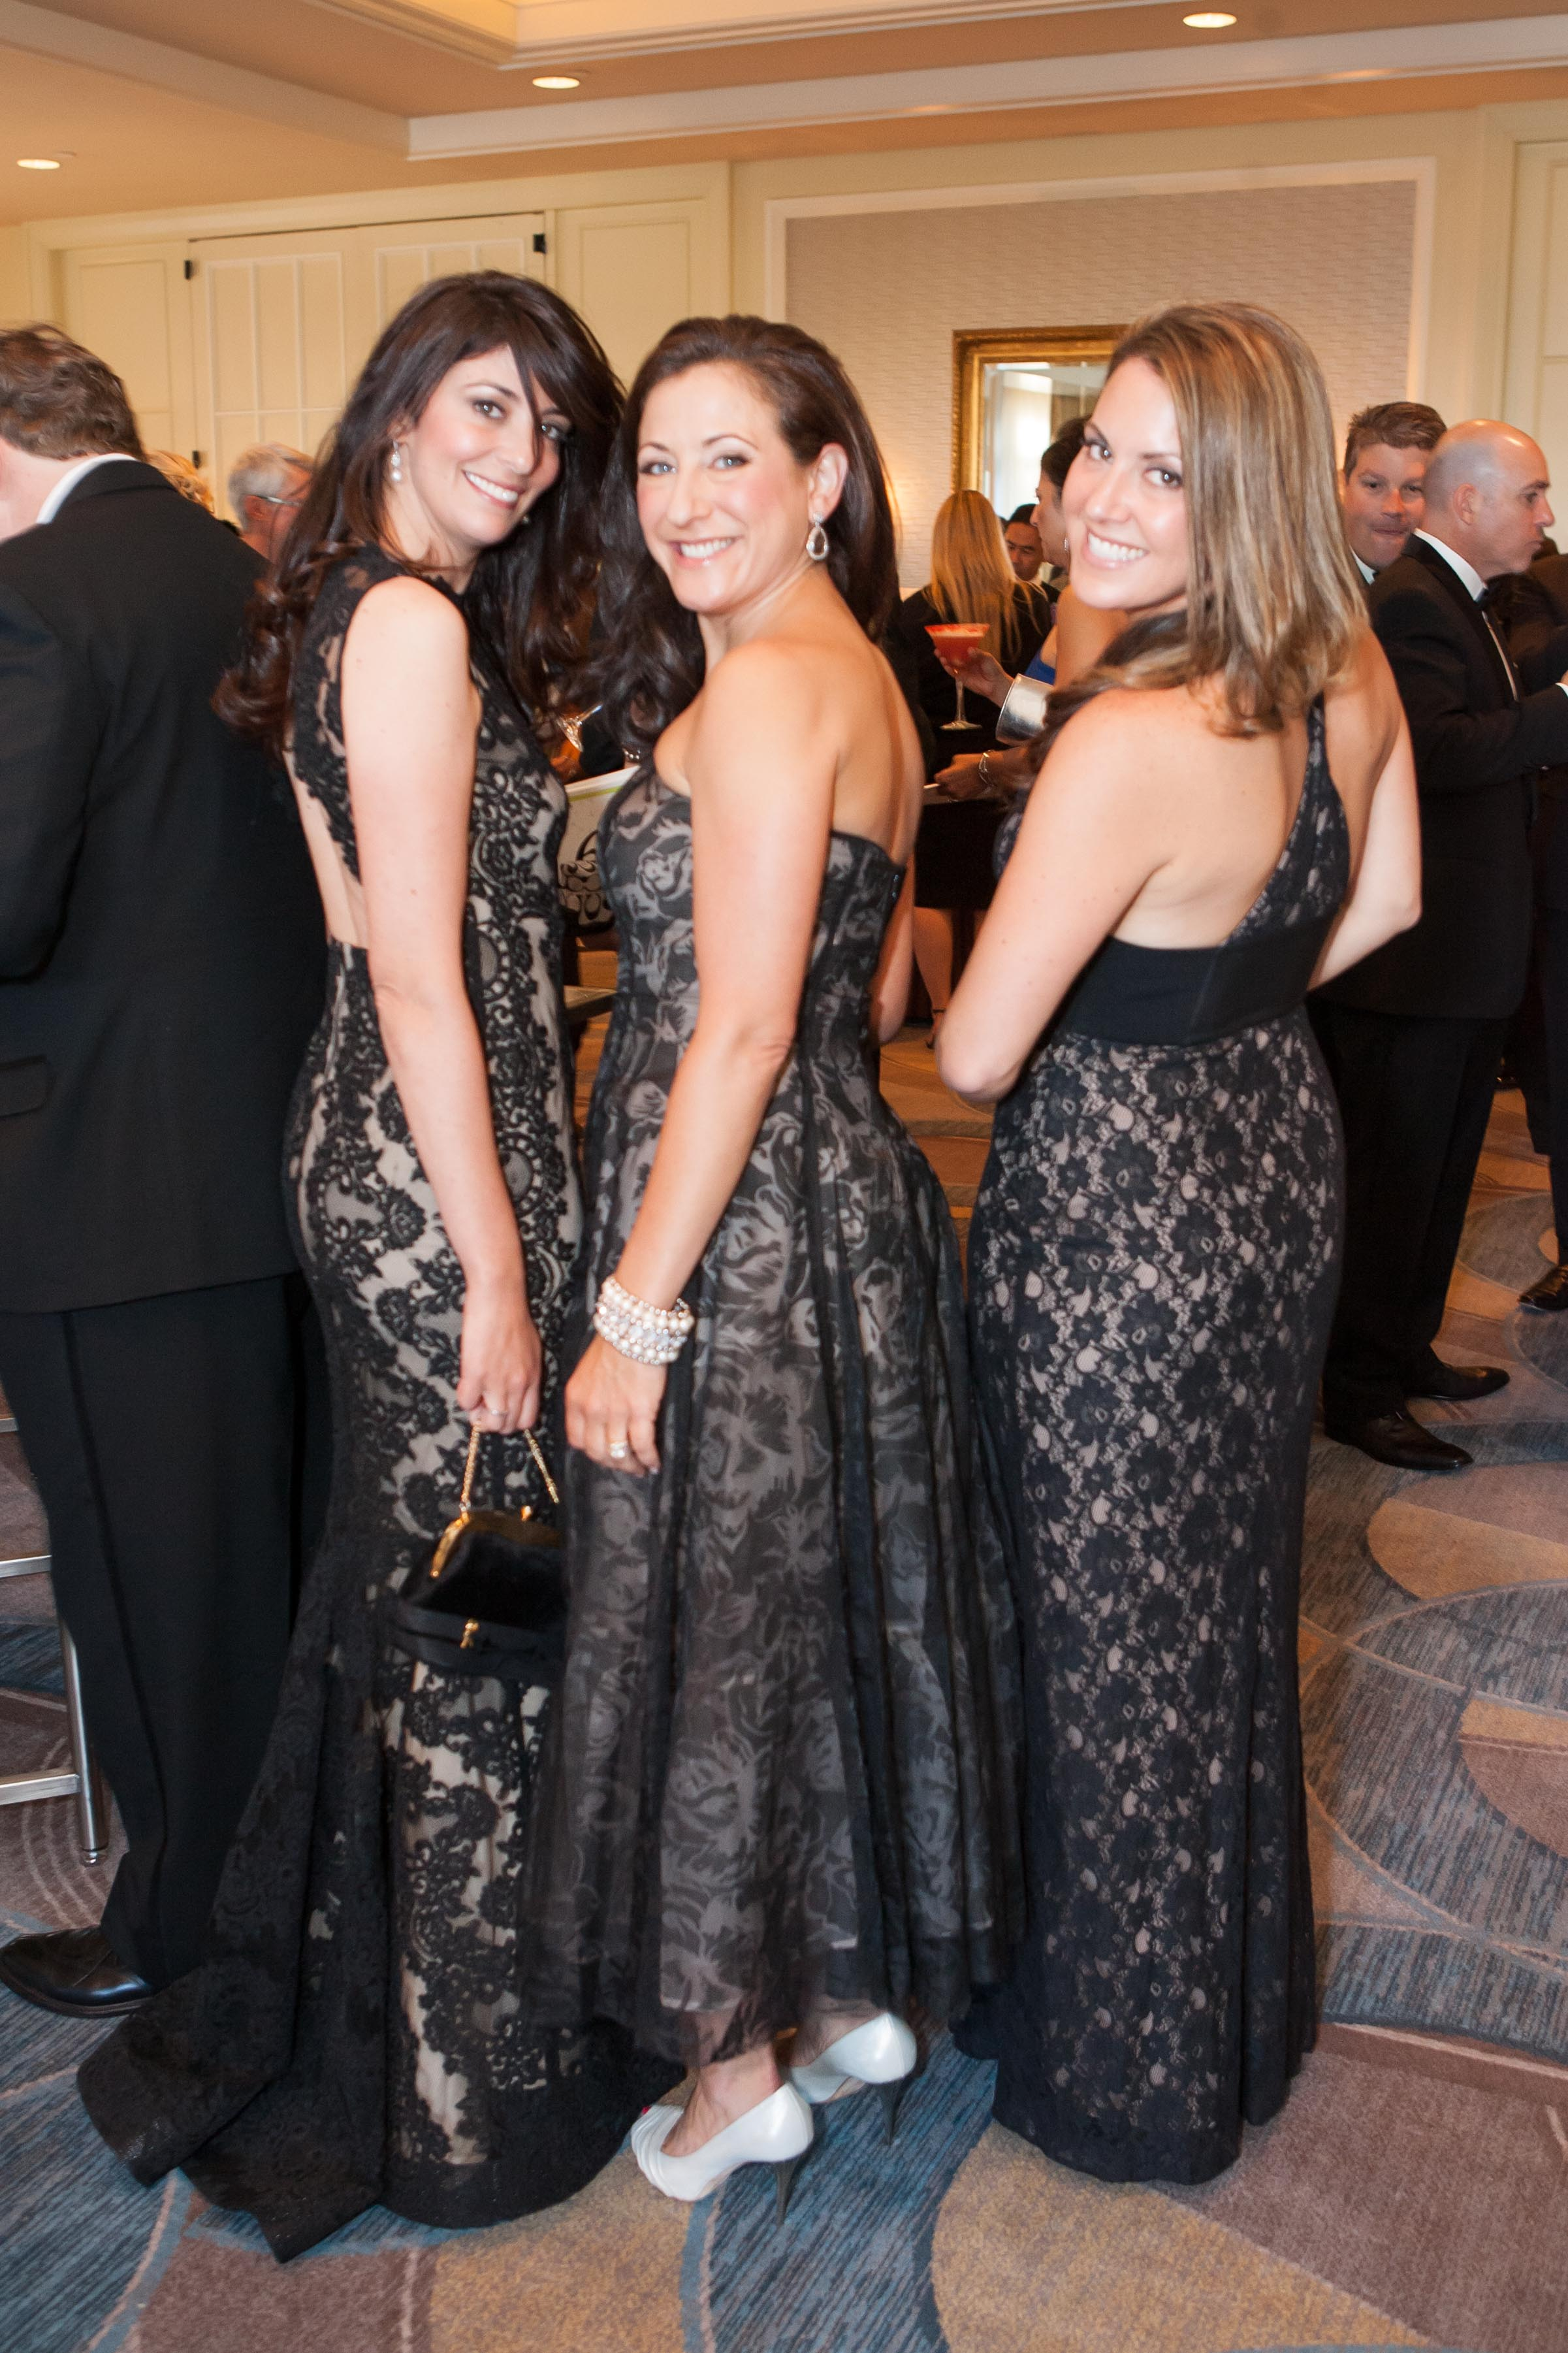 Marissa Shipman, Victoria Dade, Susan Hansen